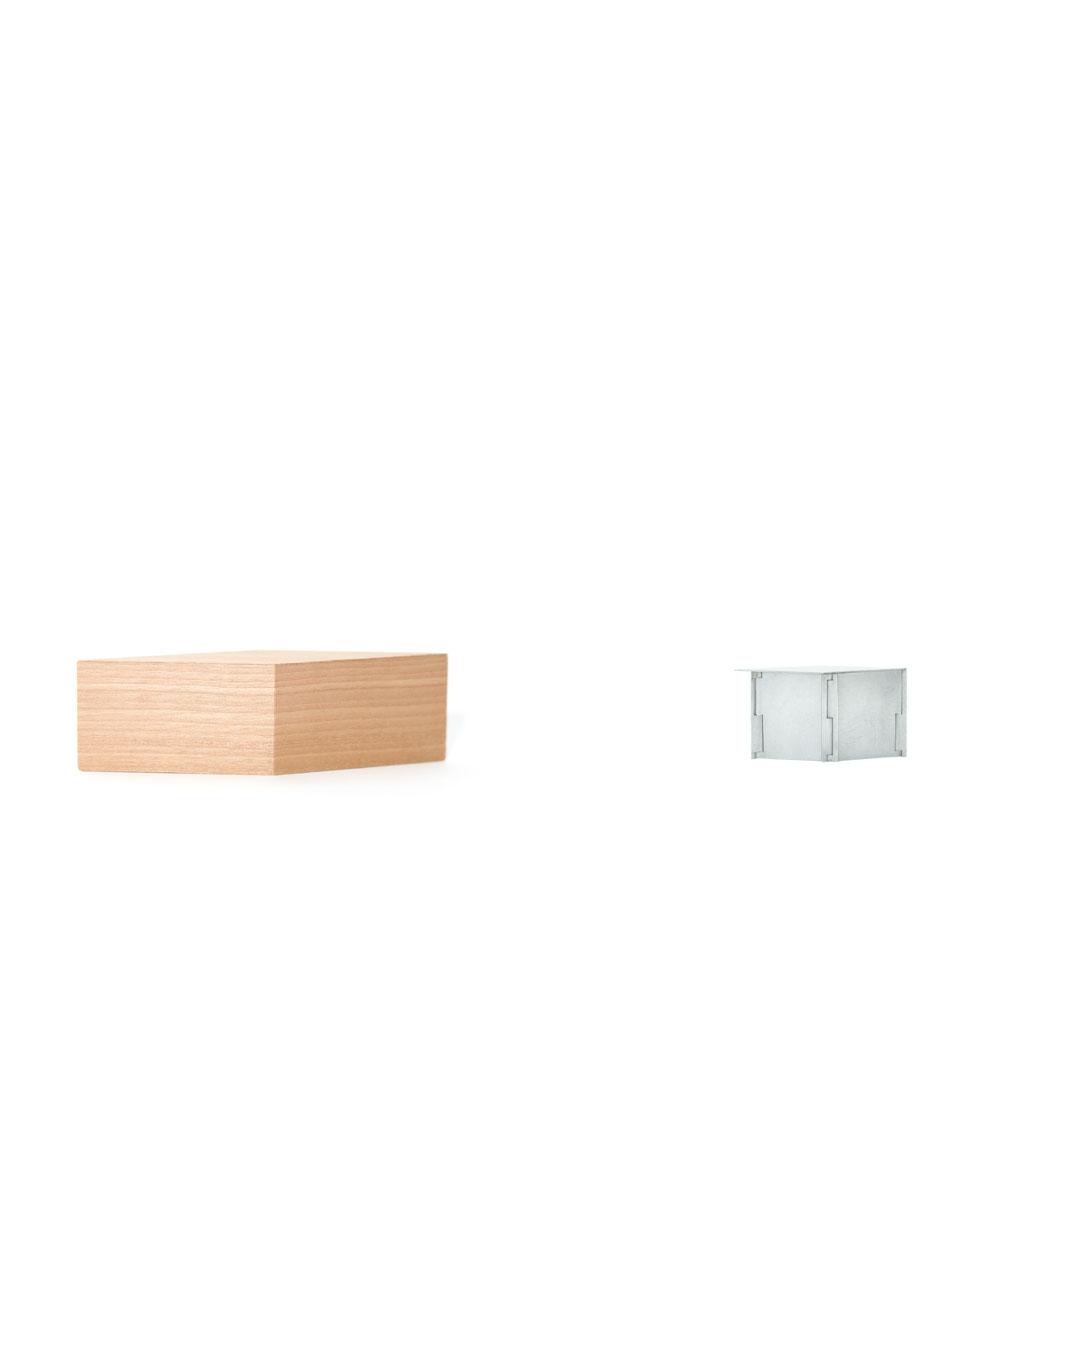 Junwon Jung, Box 4, 2019, brooch; zinc, silver, steel, wood, 75 x 35 x 80 mm, €2420 (image 2/2)